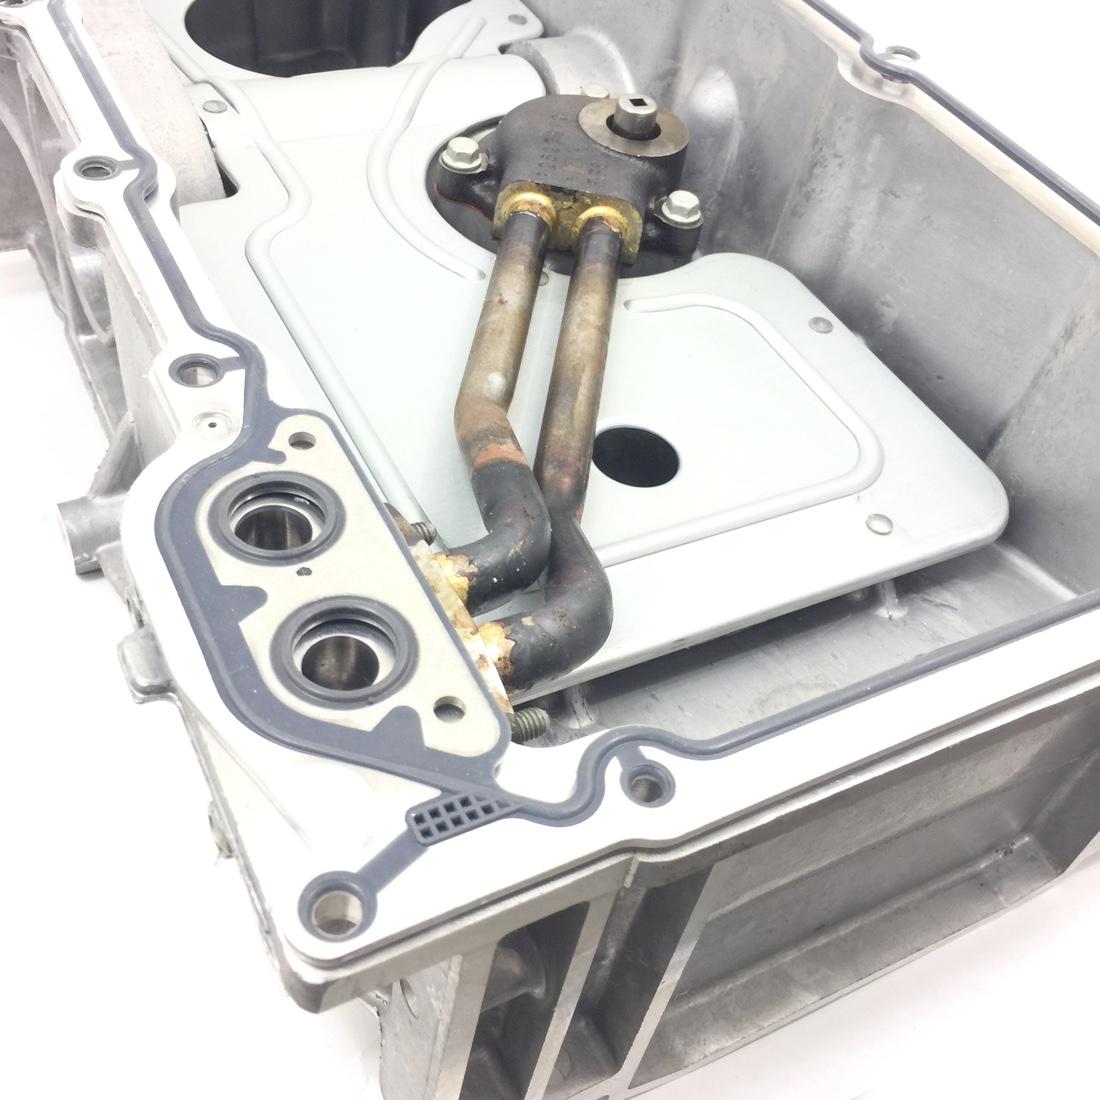 Saab 900 Engine Oil Pan Gasket Original Equipment 7514946